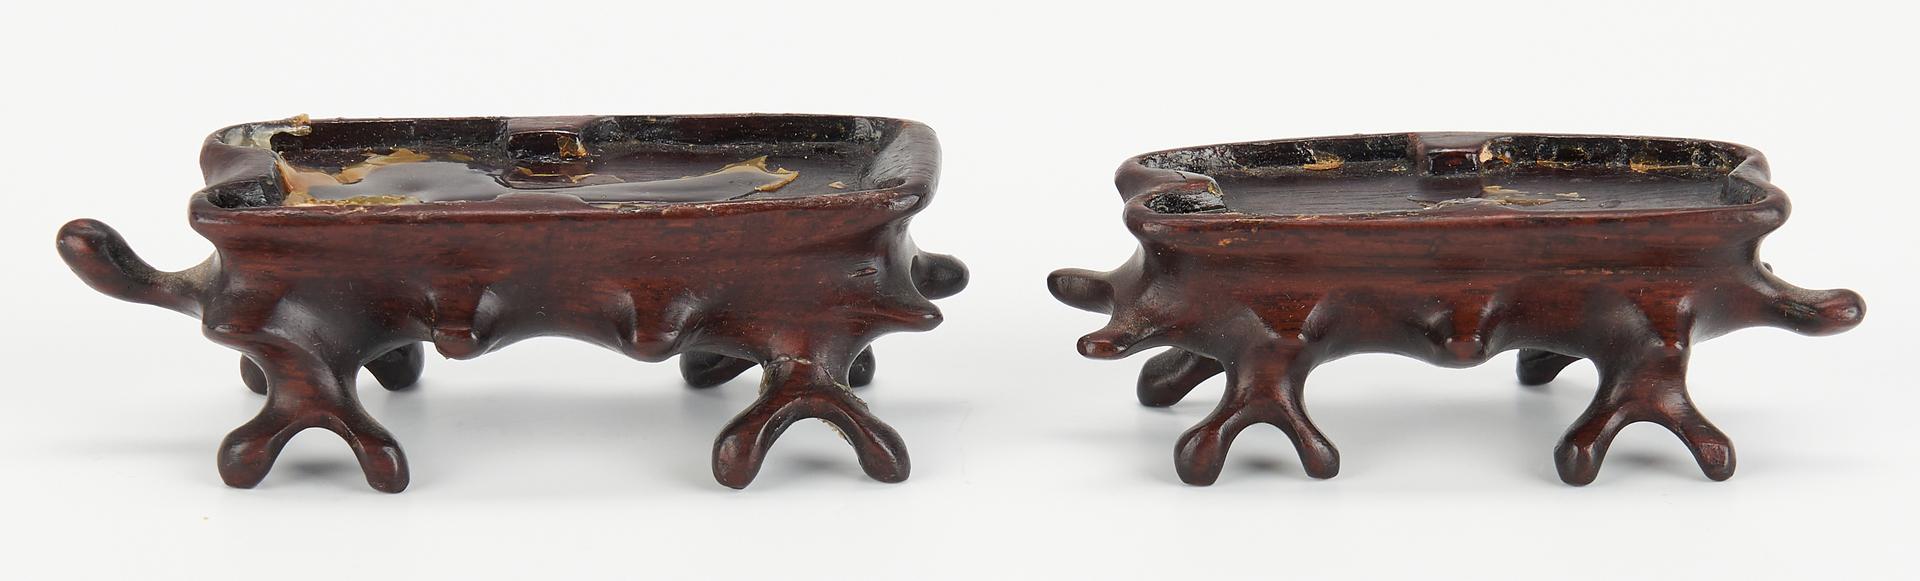 Lot 413: Pr. Chinese Quan Yin Sculptures & Pr. Carved Rams